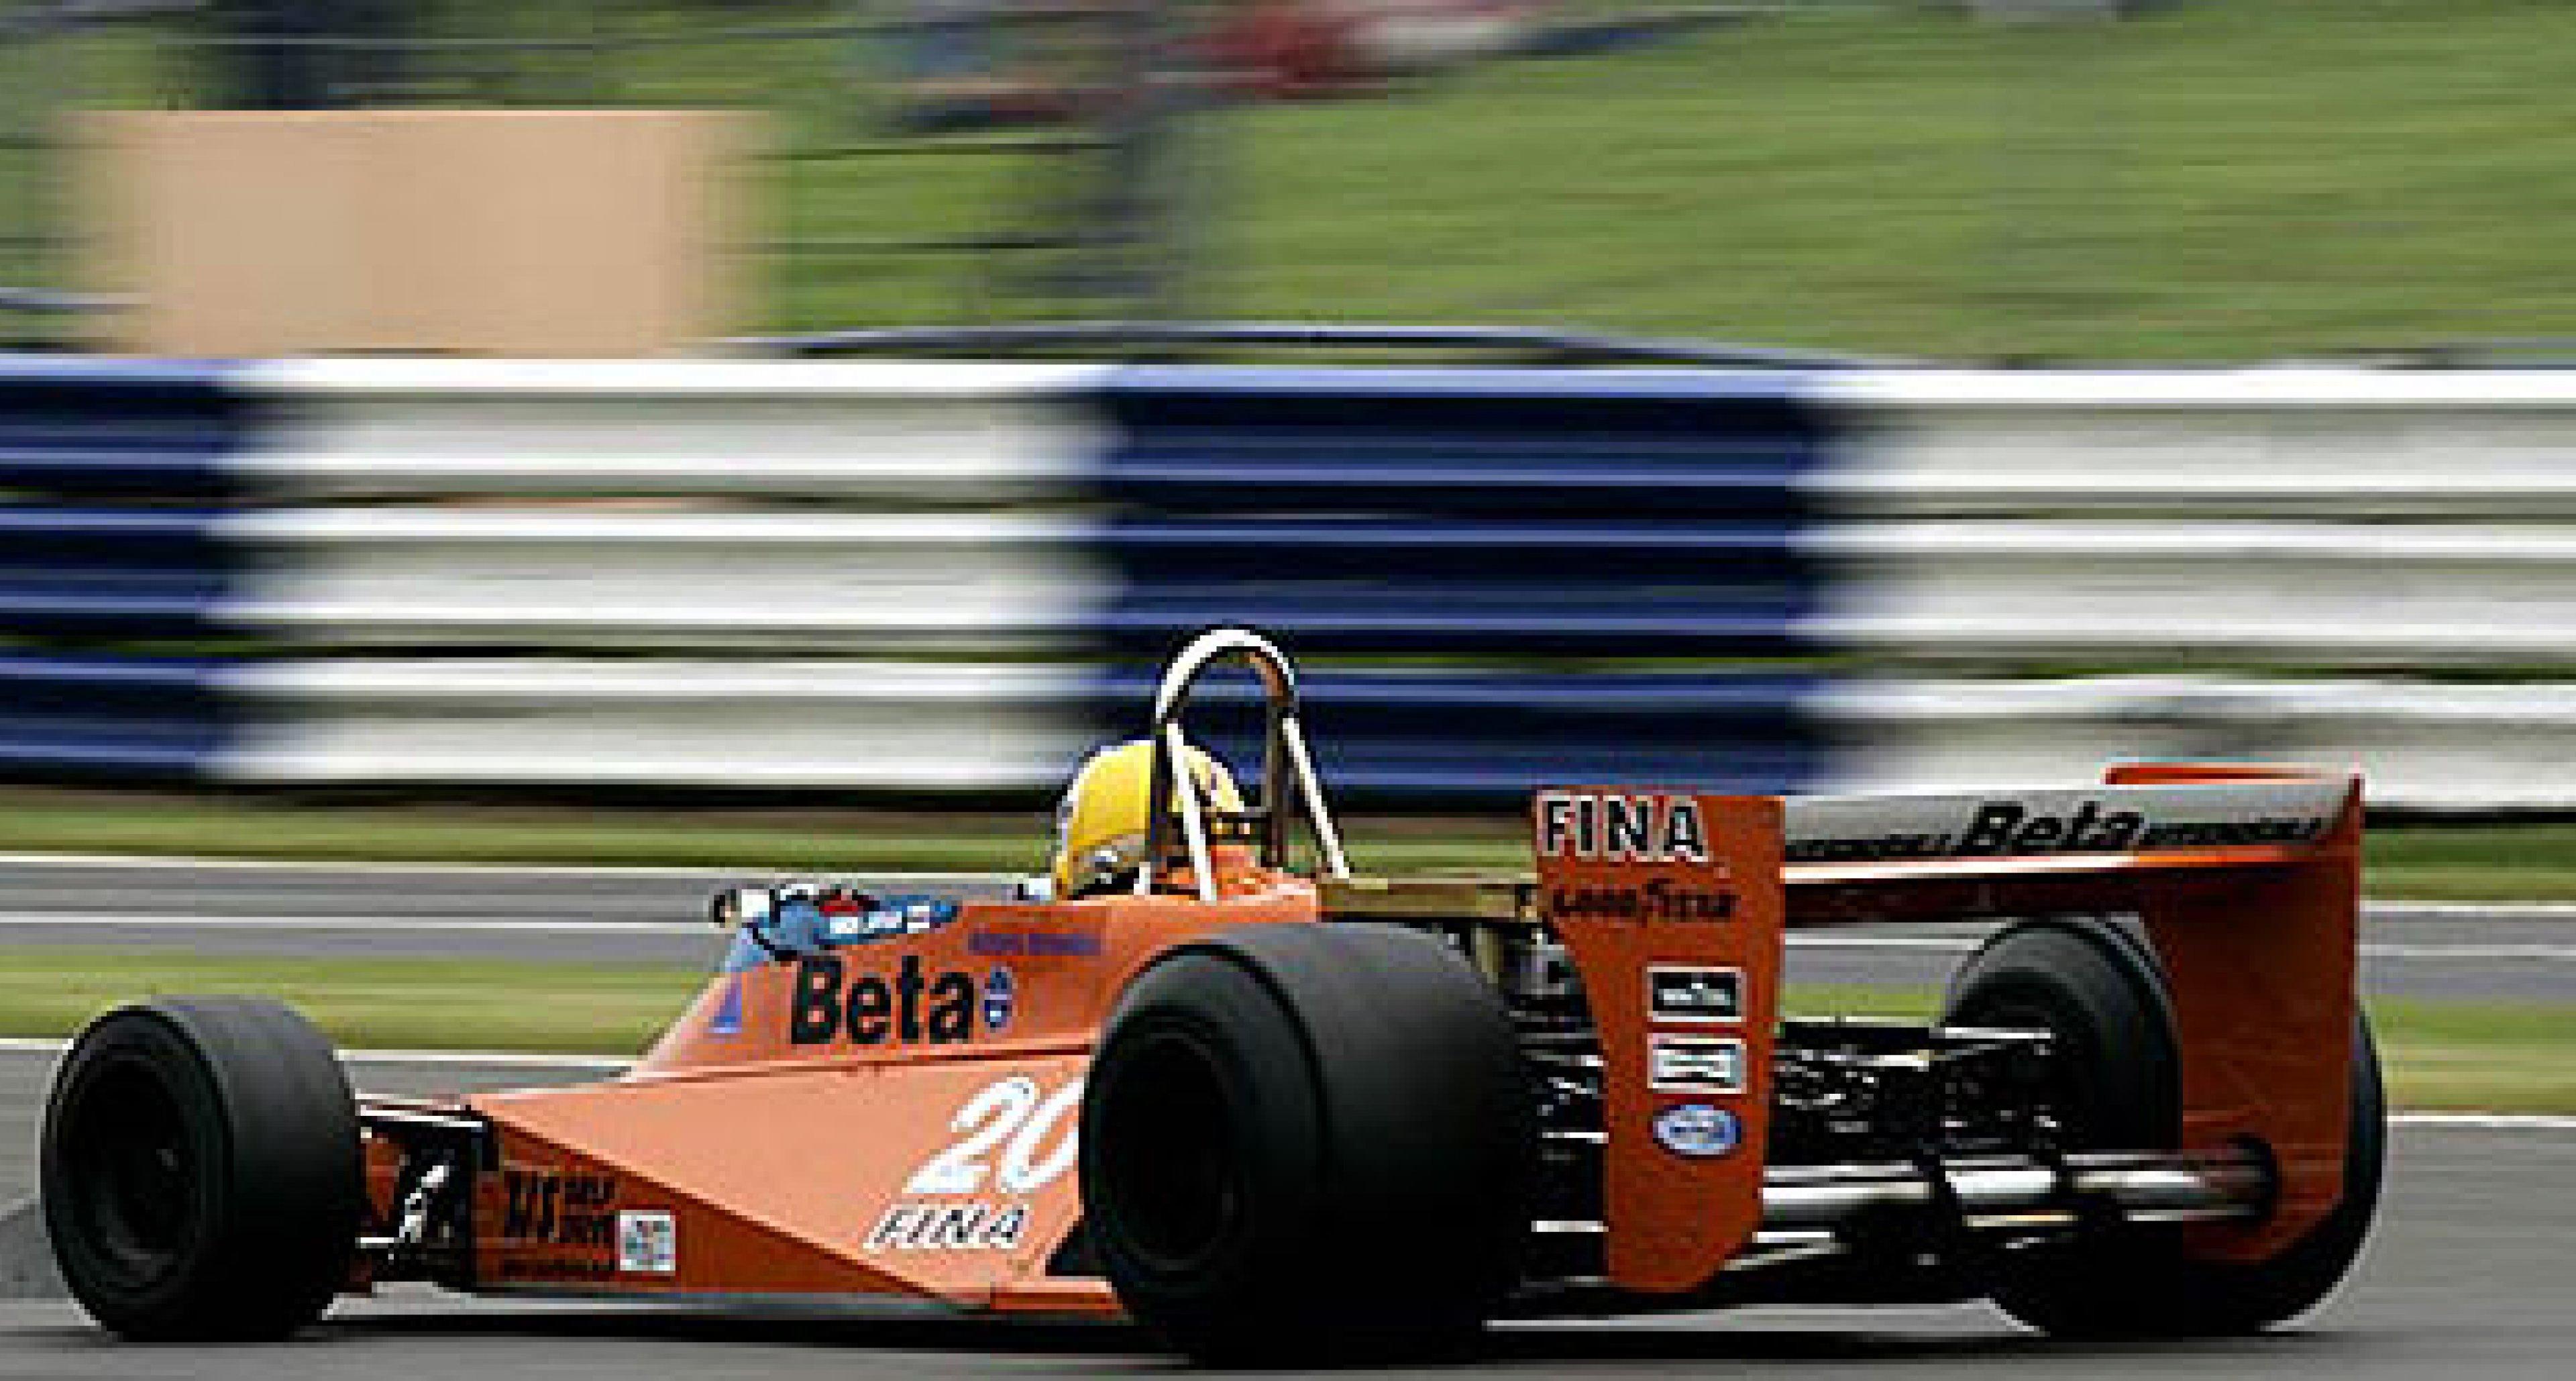 Silverstone Classic 2005